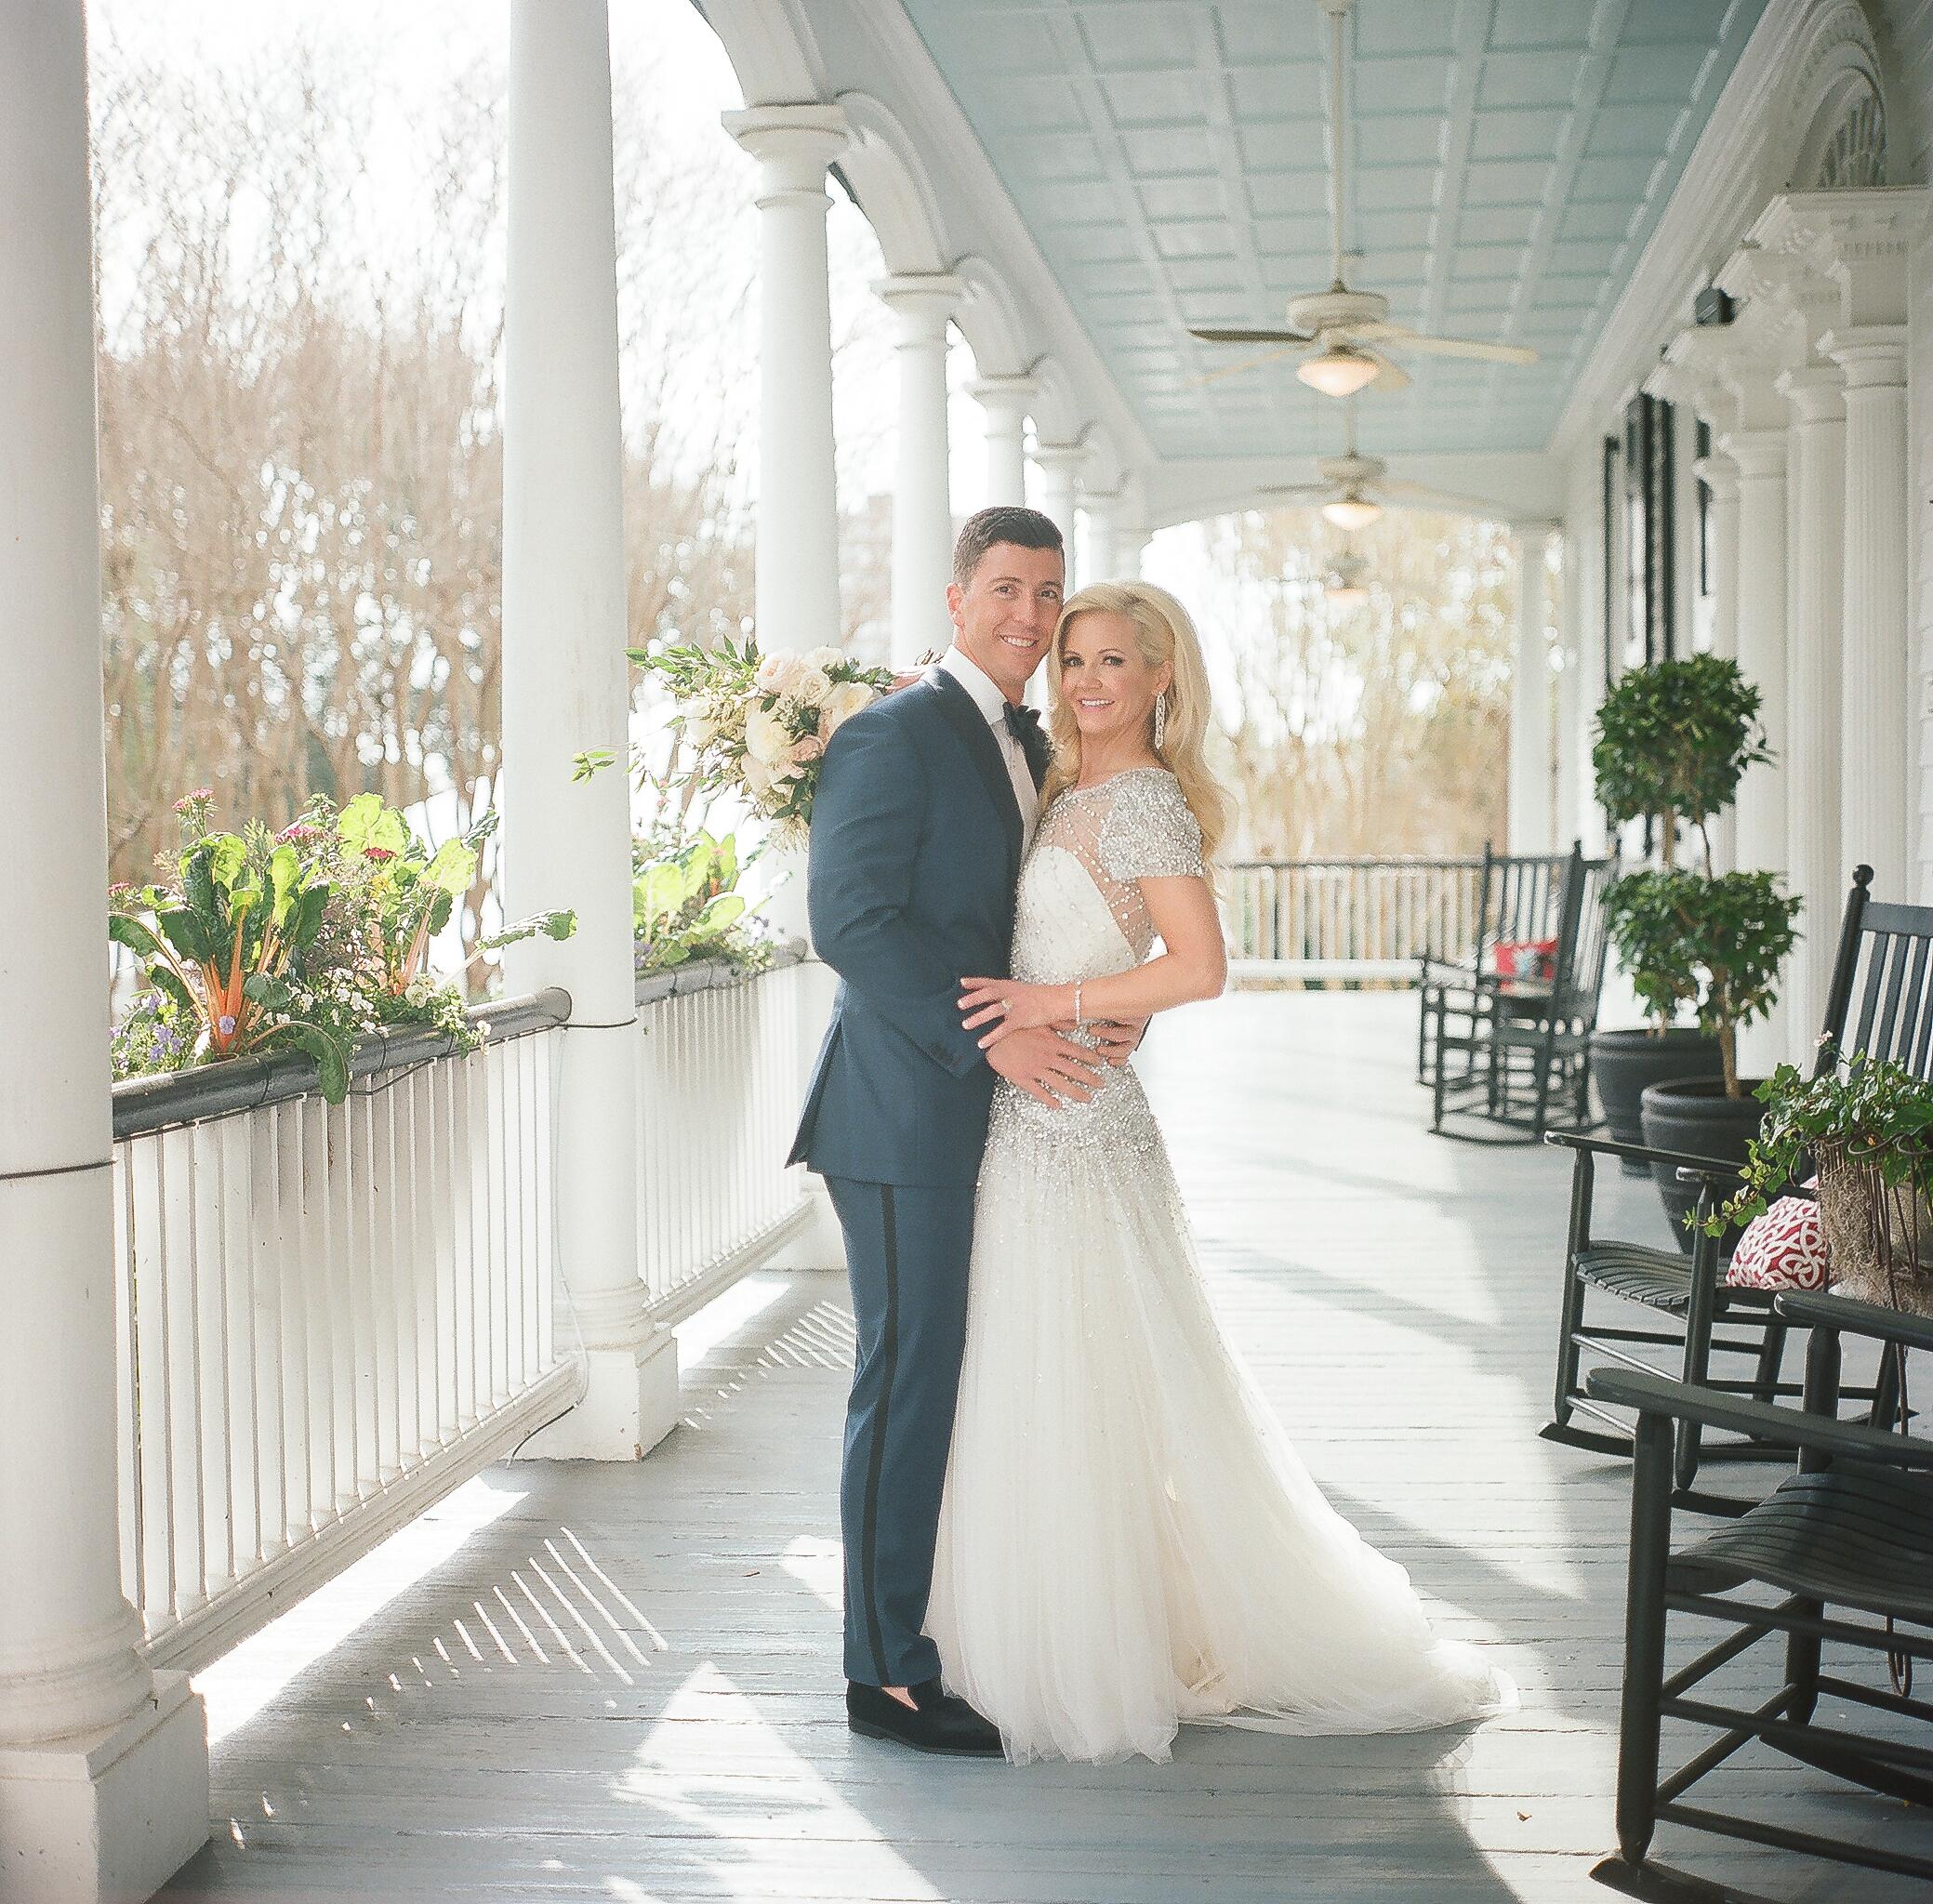 Charleston Wedding Photographers Virgil Bunao Allison and Christian | Charleston Wedding | Part Two